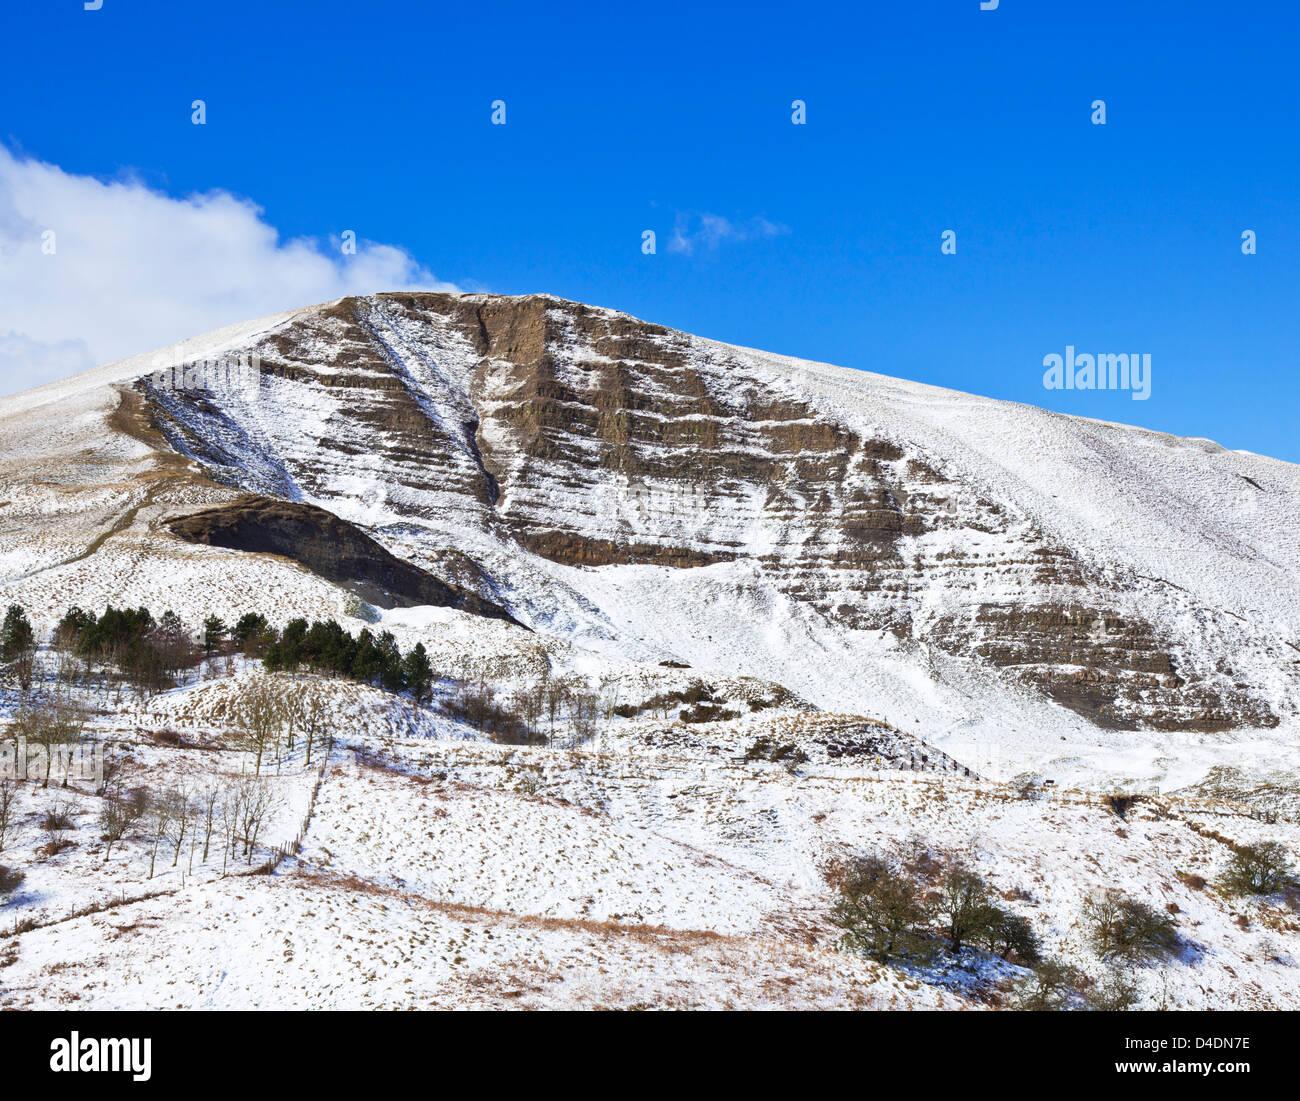 Mam tor ridge (great ridge) covered in snow Derbyshire Peak district park Hope Valley England UK GB EU Europe - Stock Image